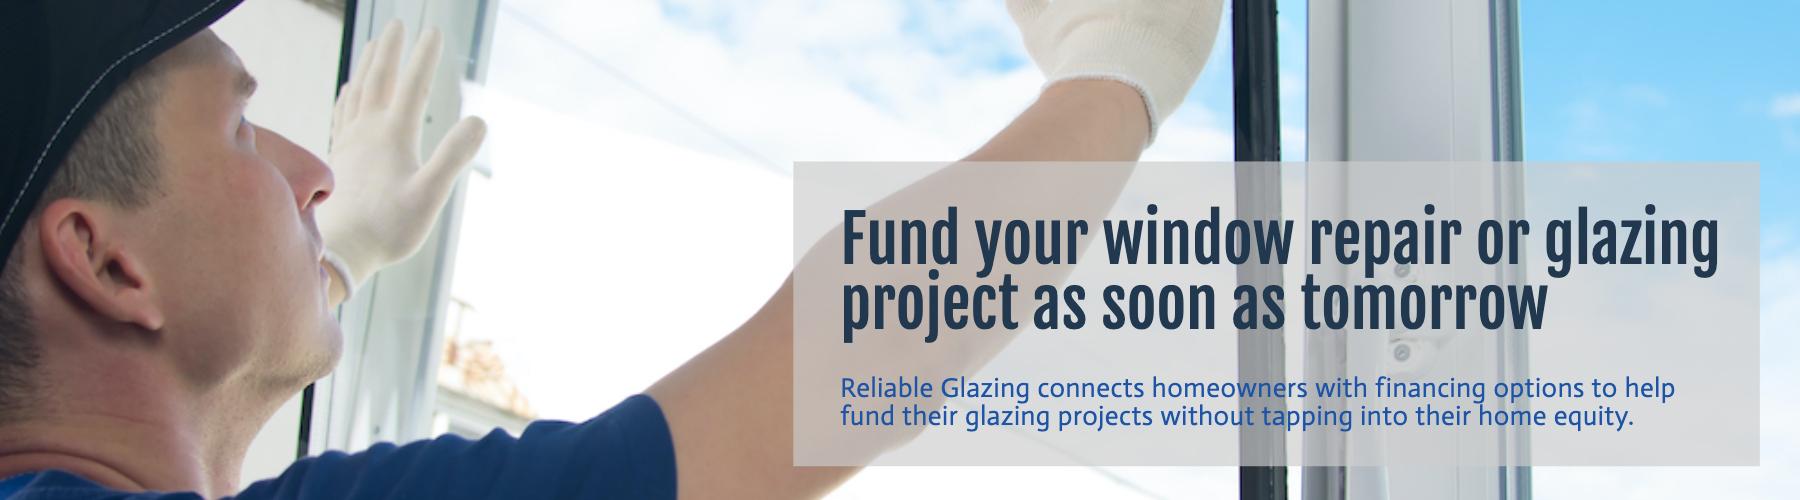 Colorado window repair and glazing financing options